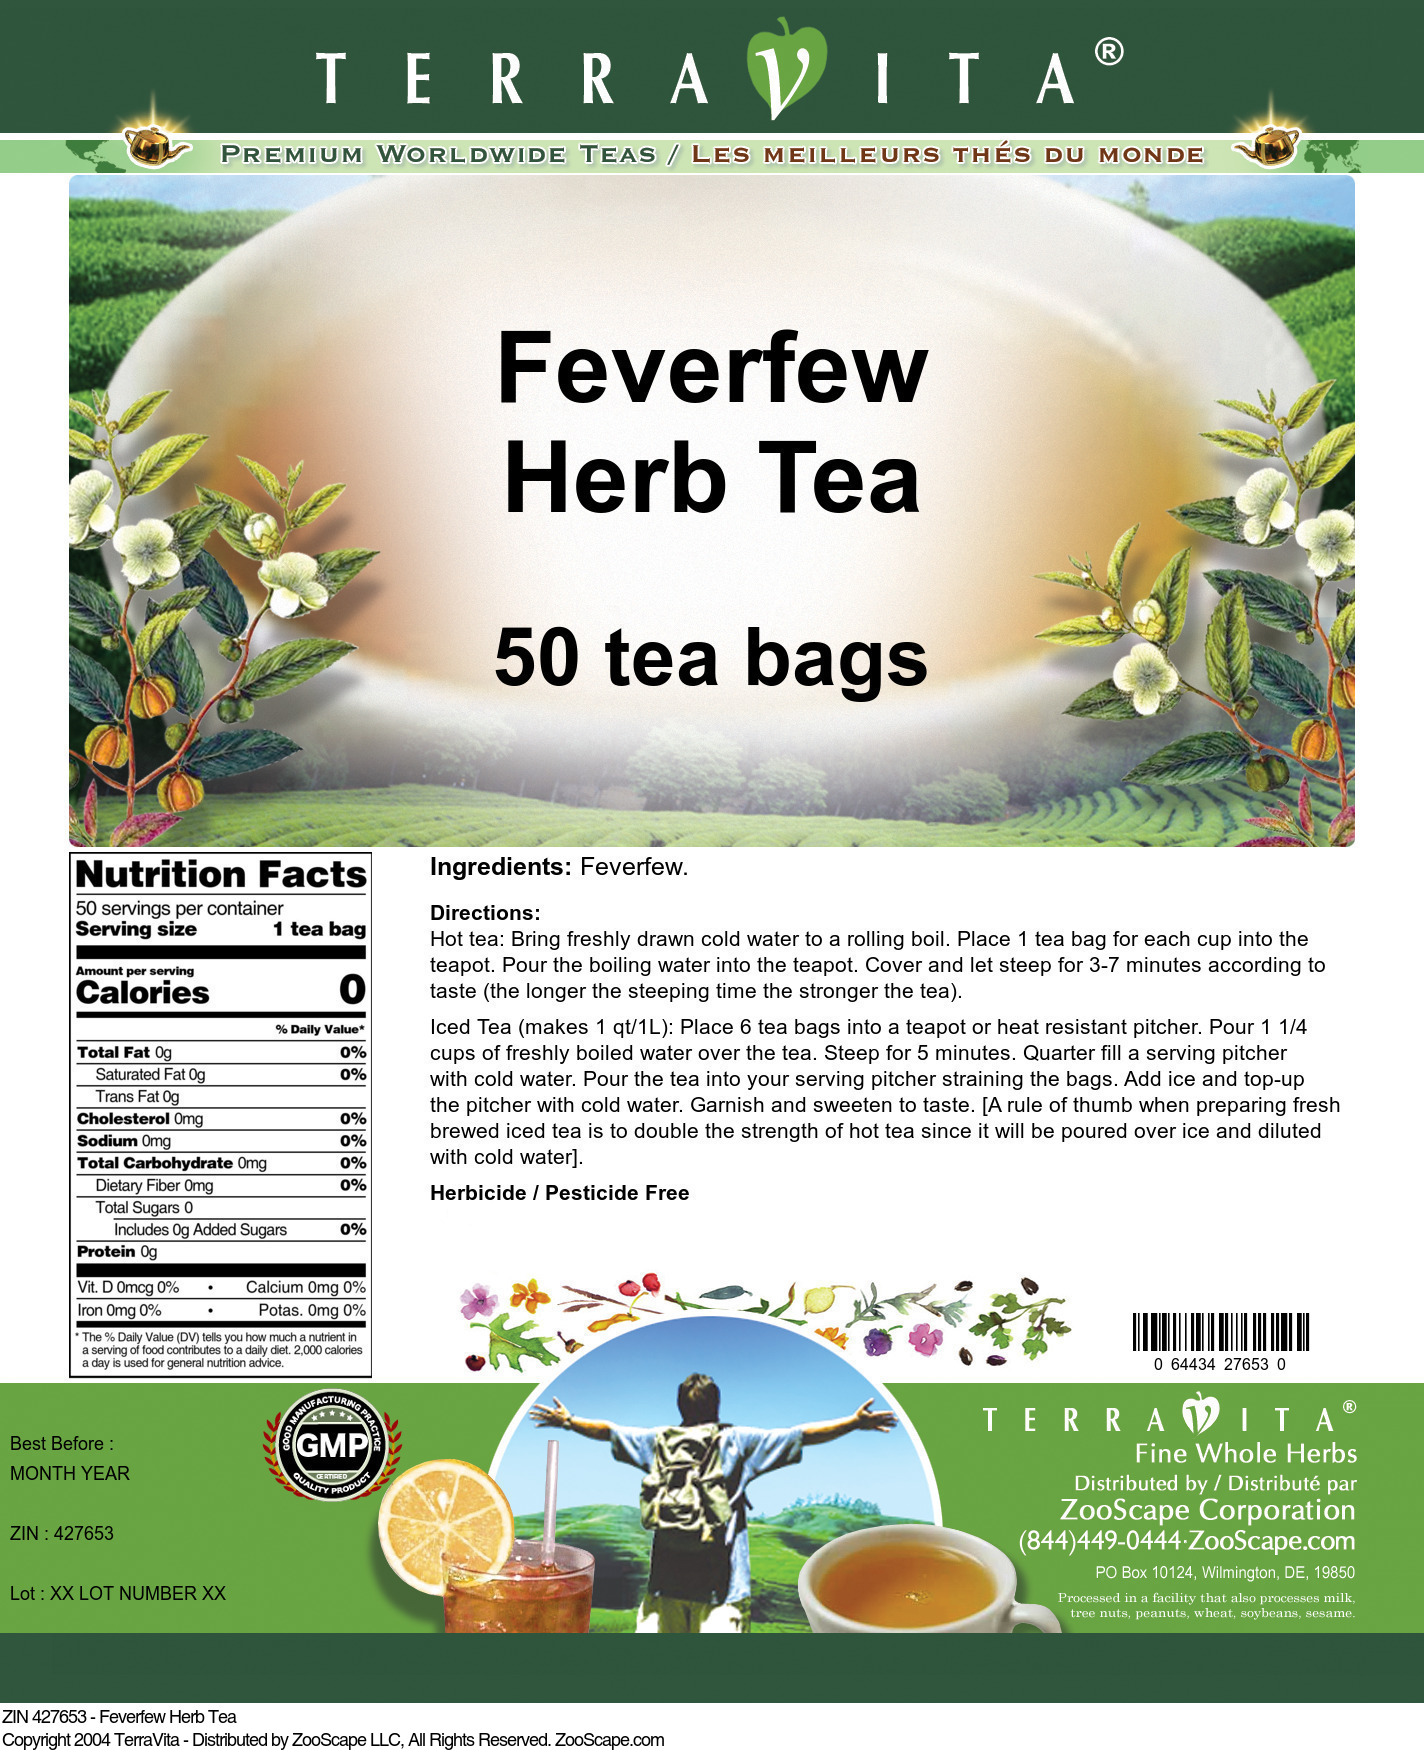 Feverfew Herb Tea